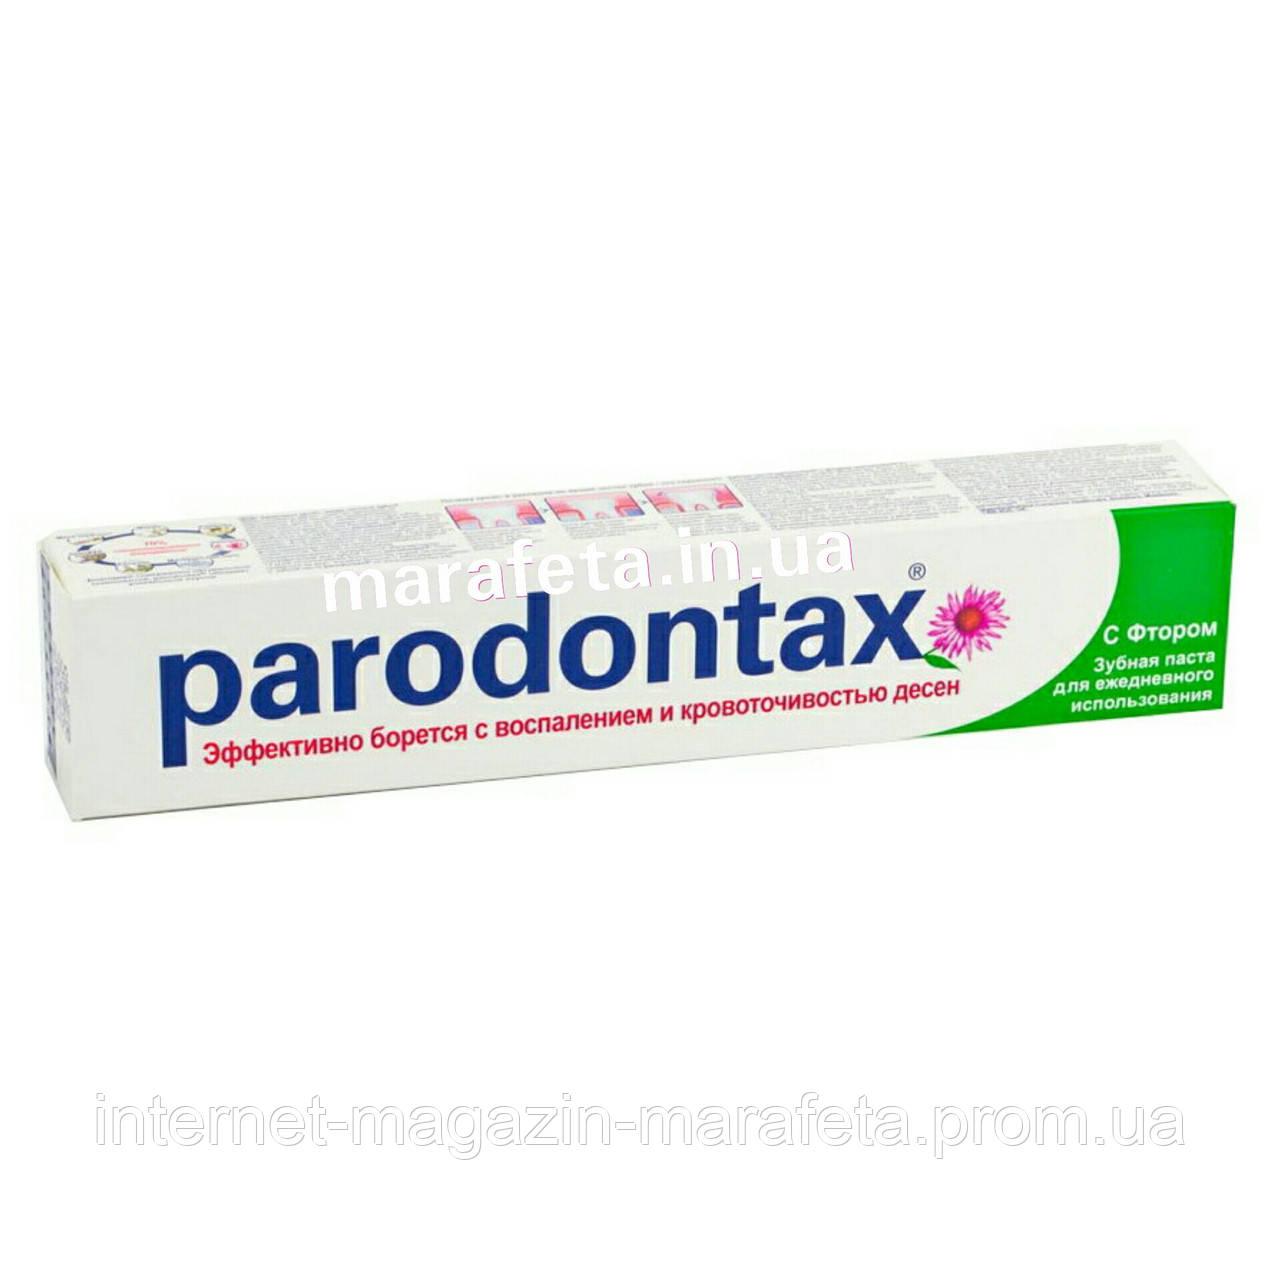 Зубная паста Parodontax с фтором 75 мл